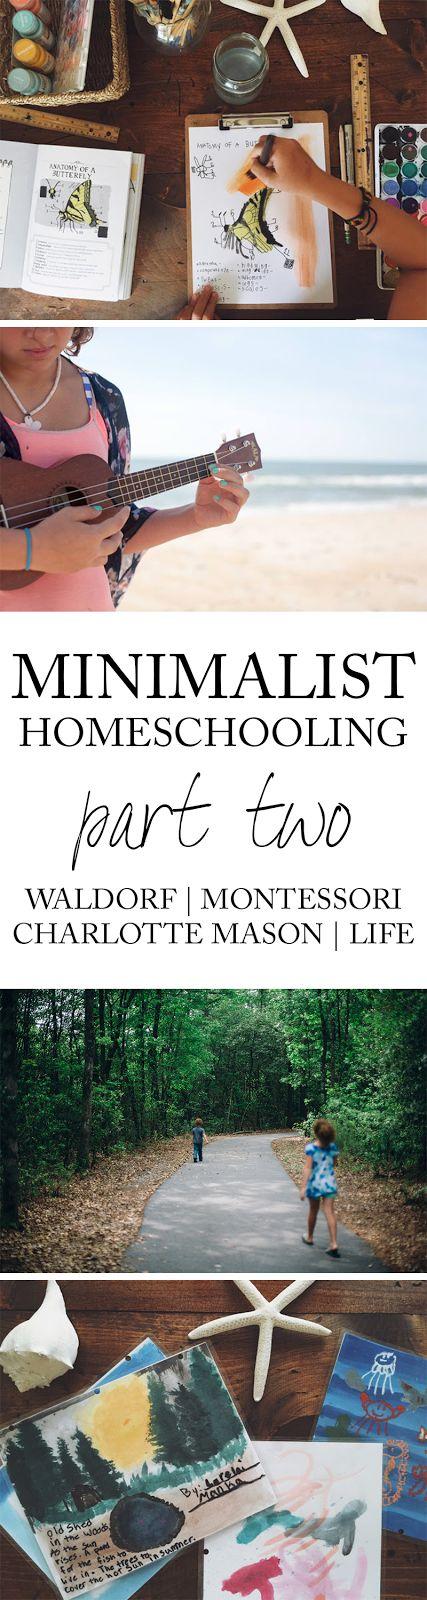 Minimalist Homeschooling. Our journey with waldorf, montessori, charlotte mason and life schooling.